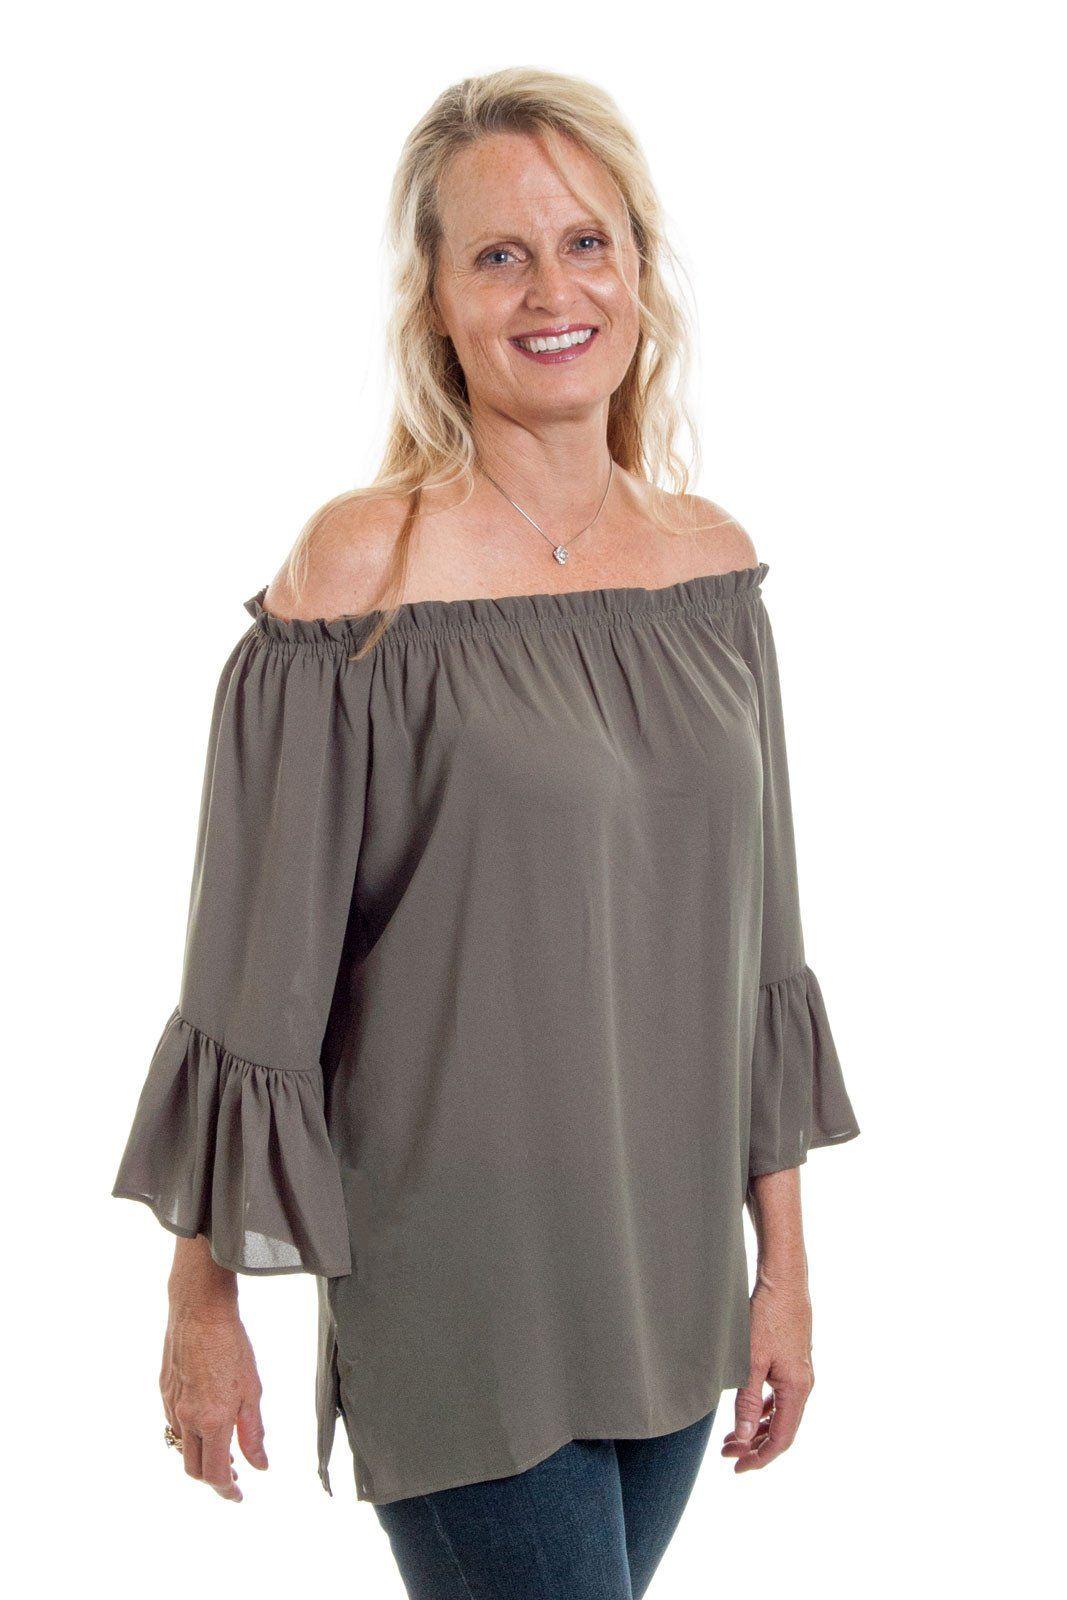 eacd1b838a0d Karen Kane - Convertible Off The Shoulder Top in Olive (2L25370 ...